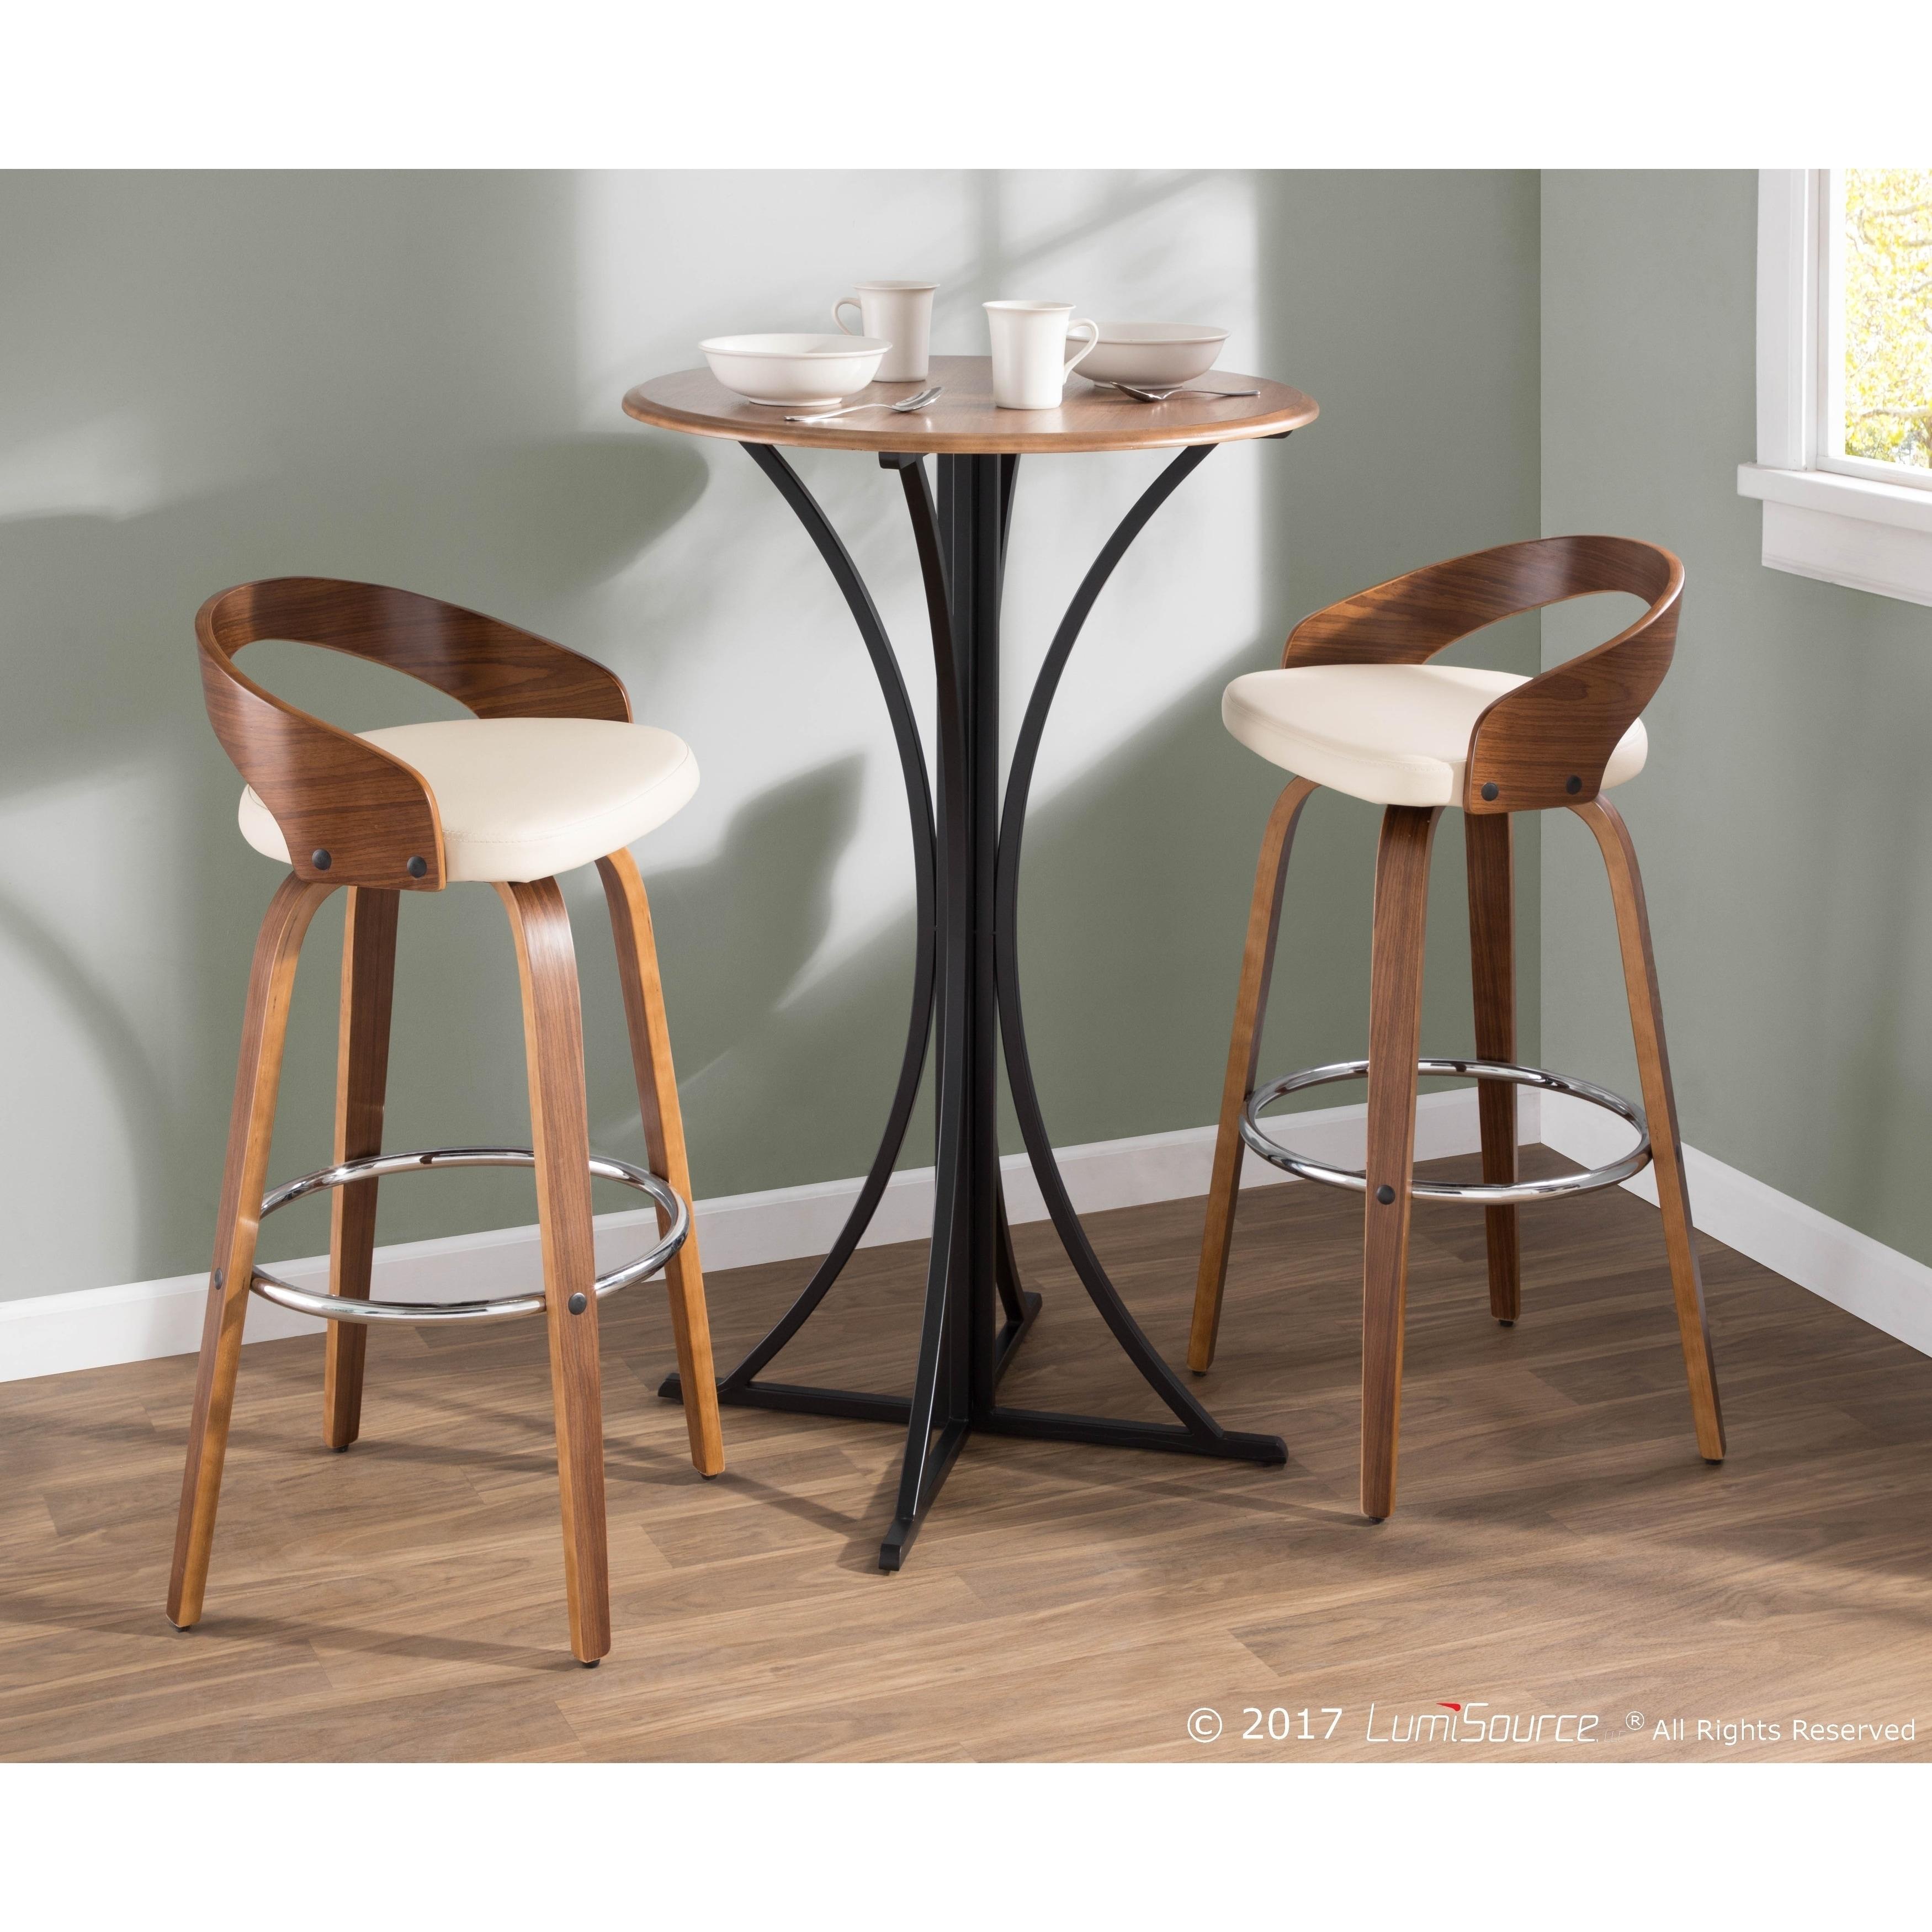 Carson carrington solavagen mid century modern wood and faux leather bar stool